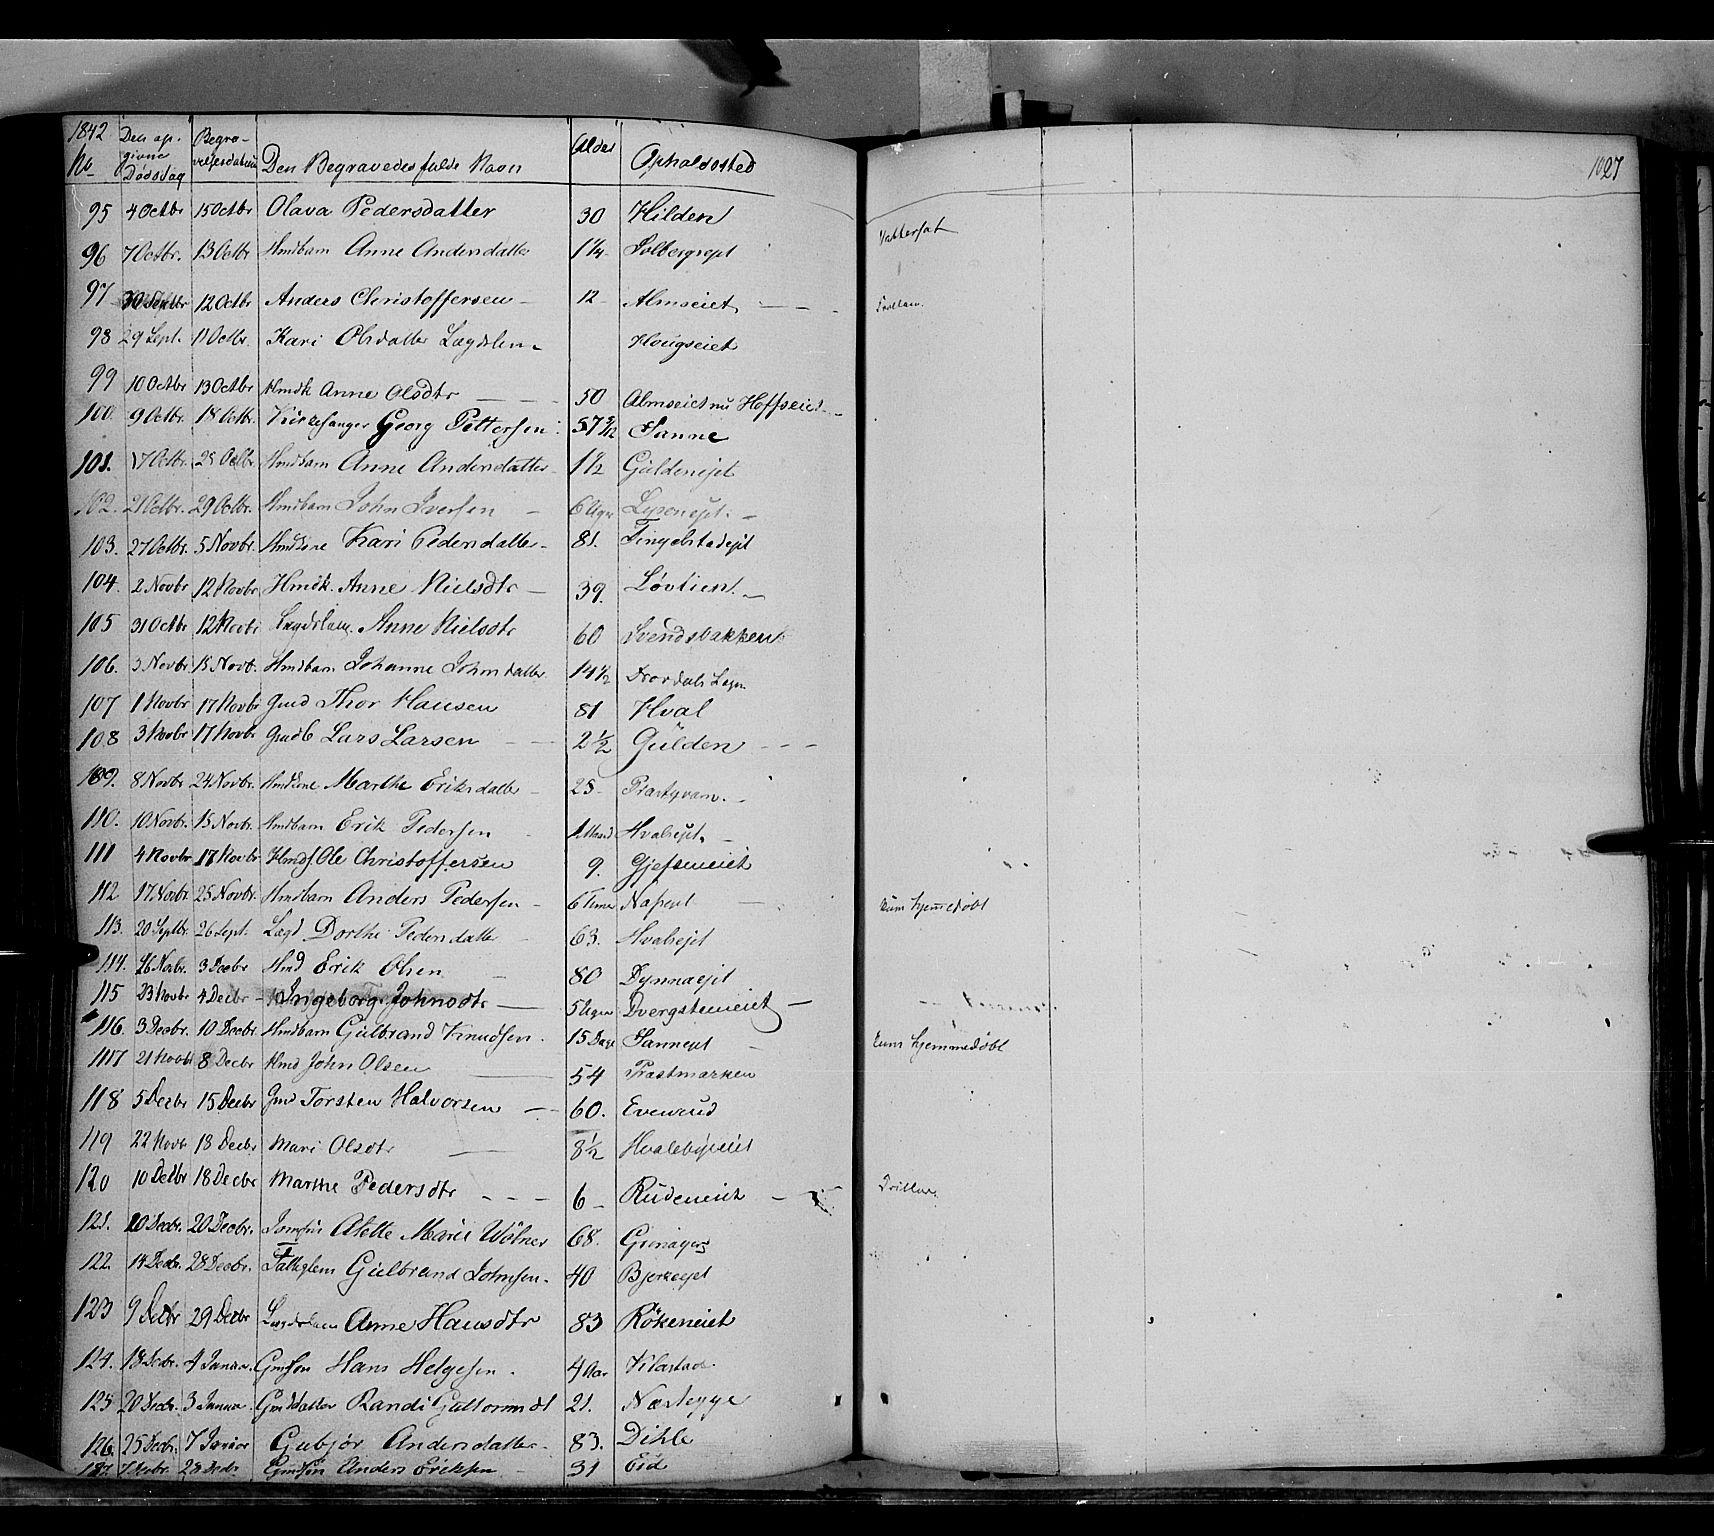 SAH, Gran prestekontor, Ministerialbok nr. 11, 1842-1856, s. 1026-1027